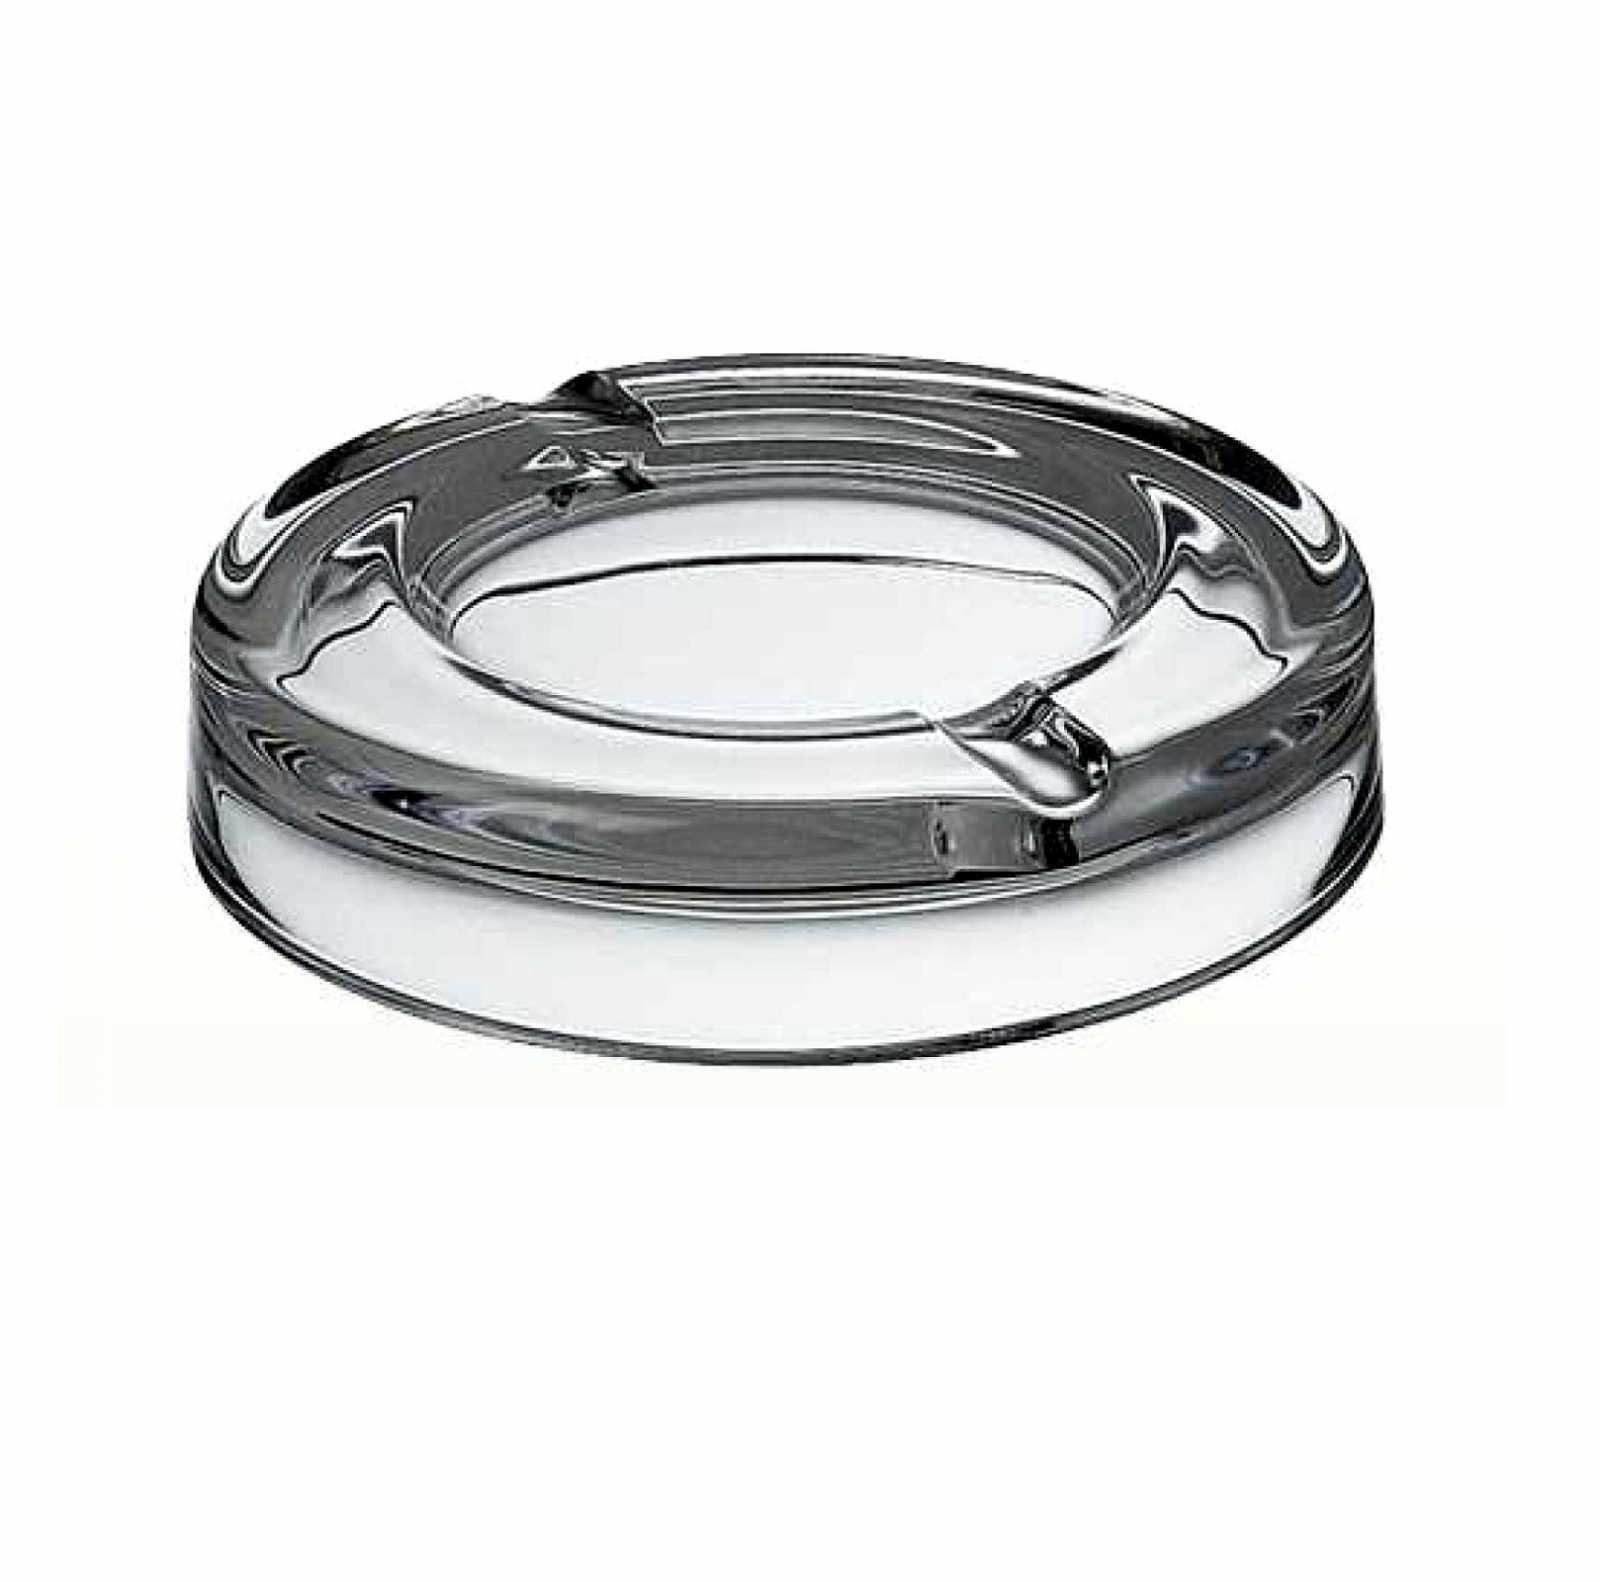 Онлайн каталог PROMENU: Пепельница стеклянная Vidivi RIALTO, диаметр 18 см, прозрачный Vidivi 60208EM